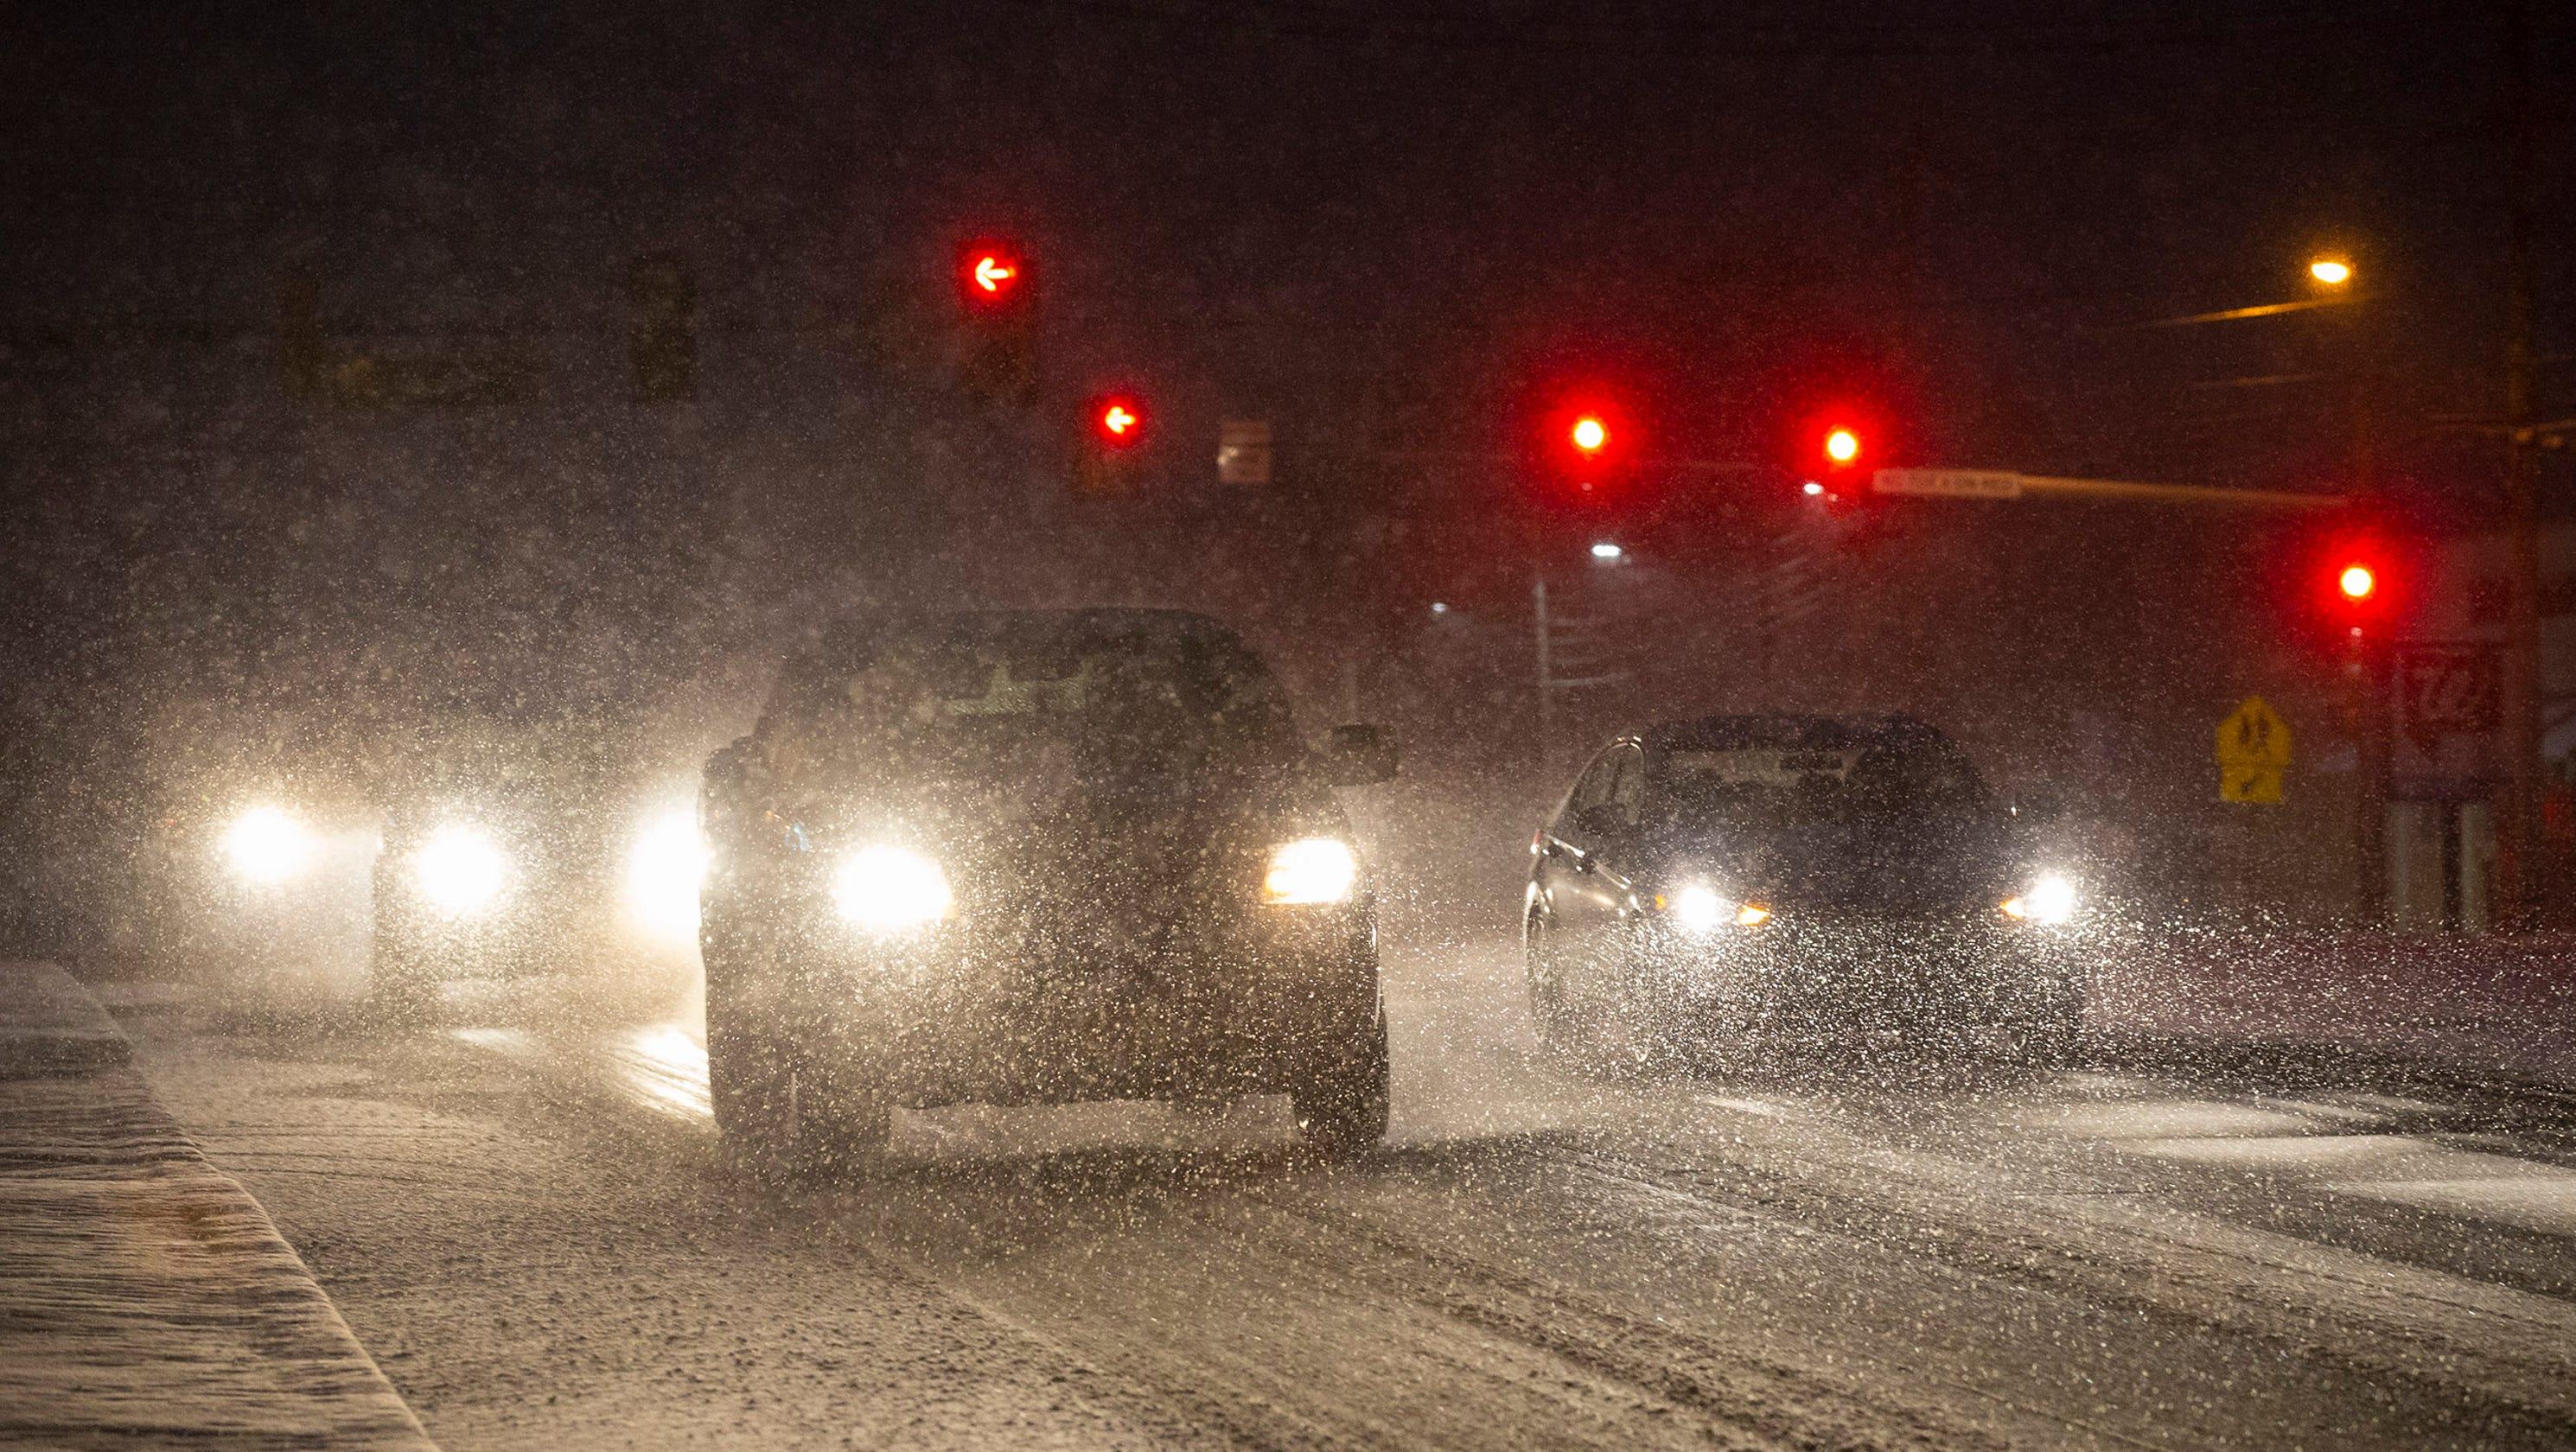 NJ weather: Snow, winter storm threaten this weekend